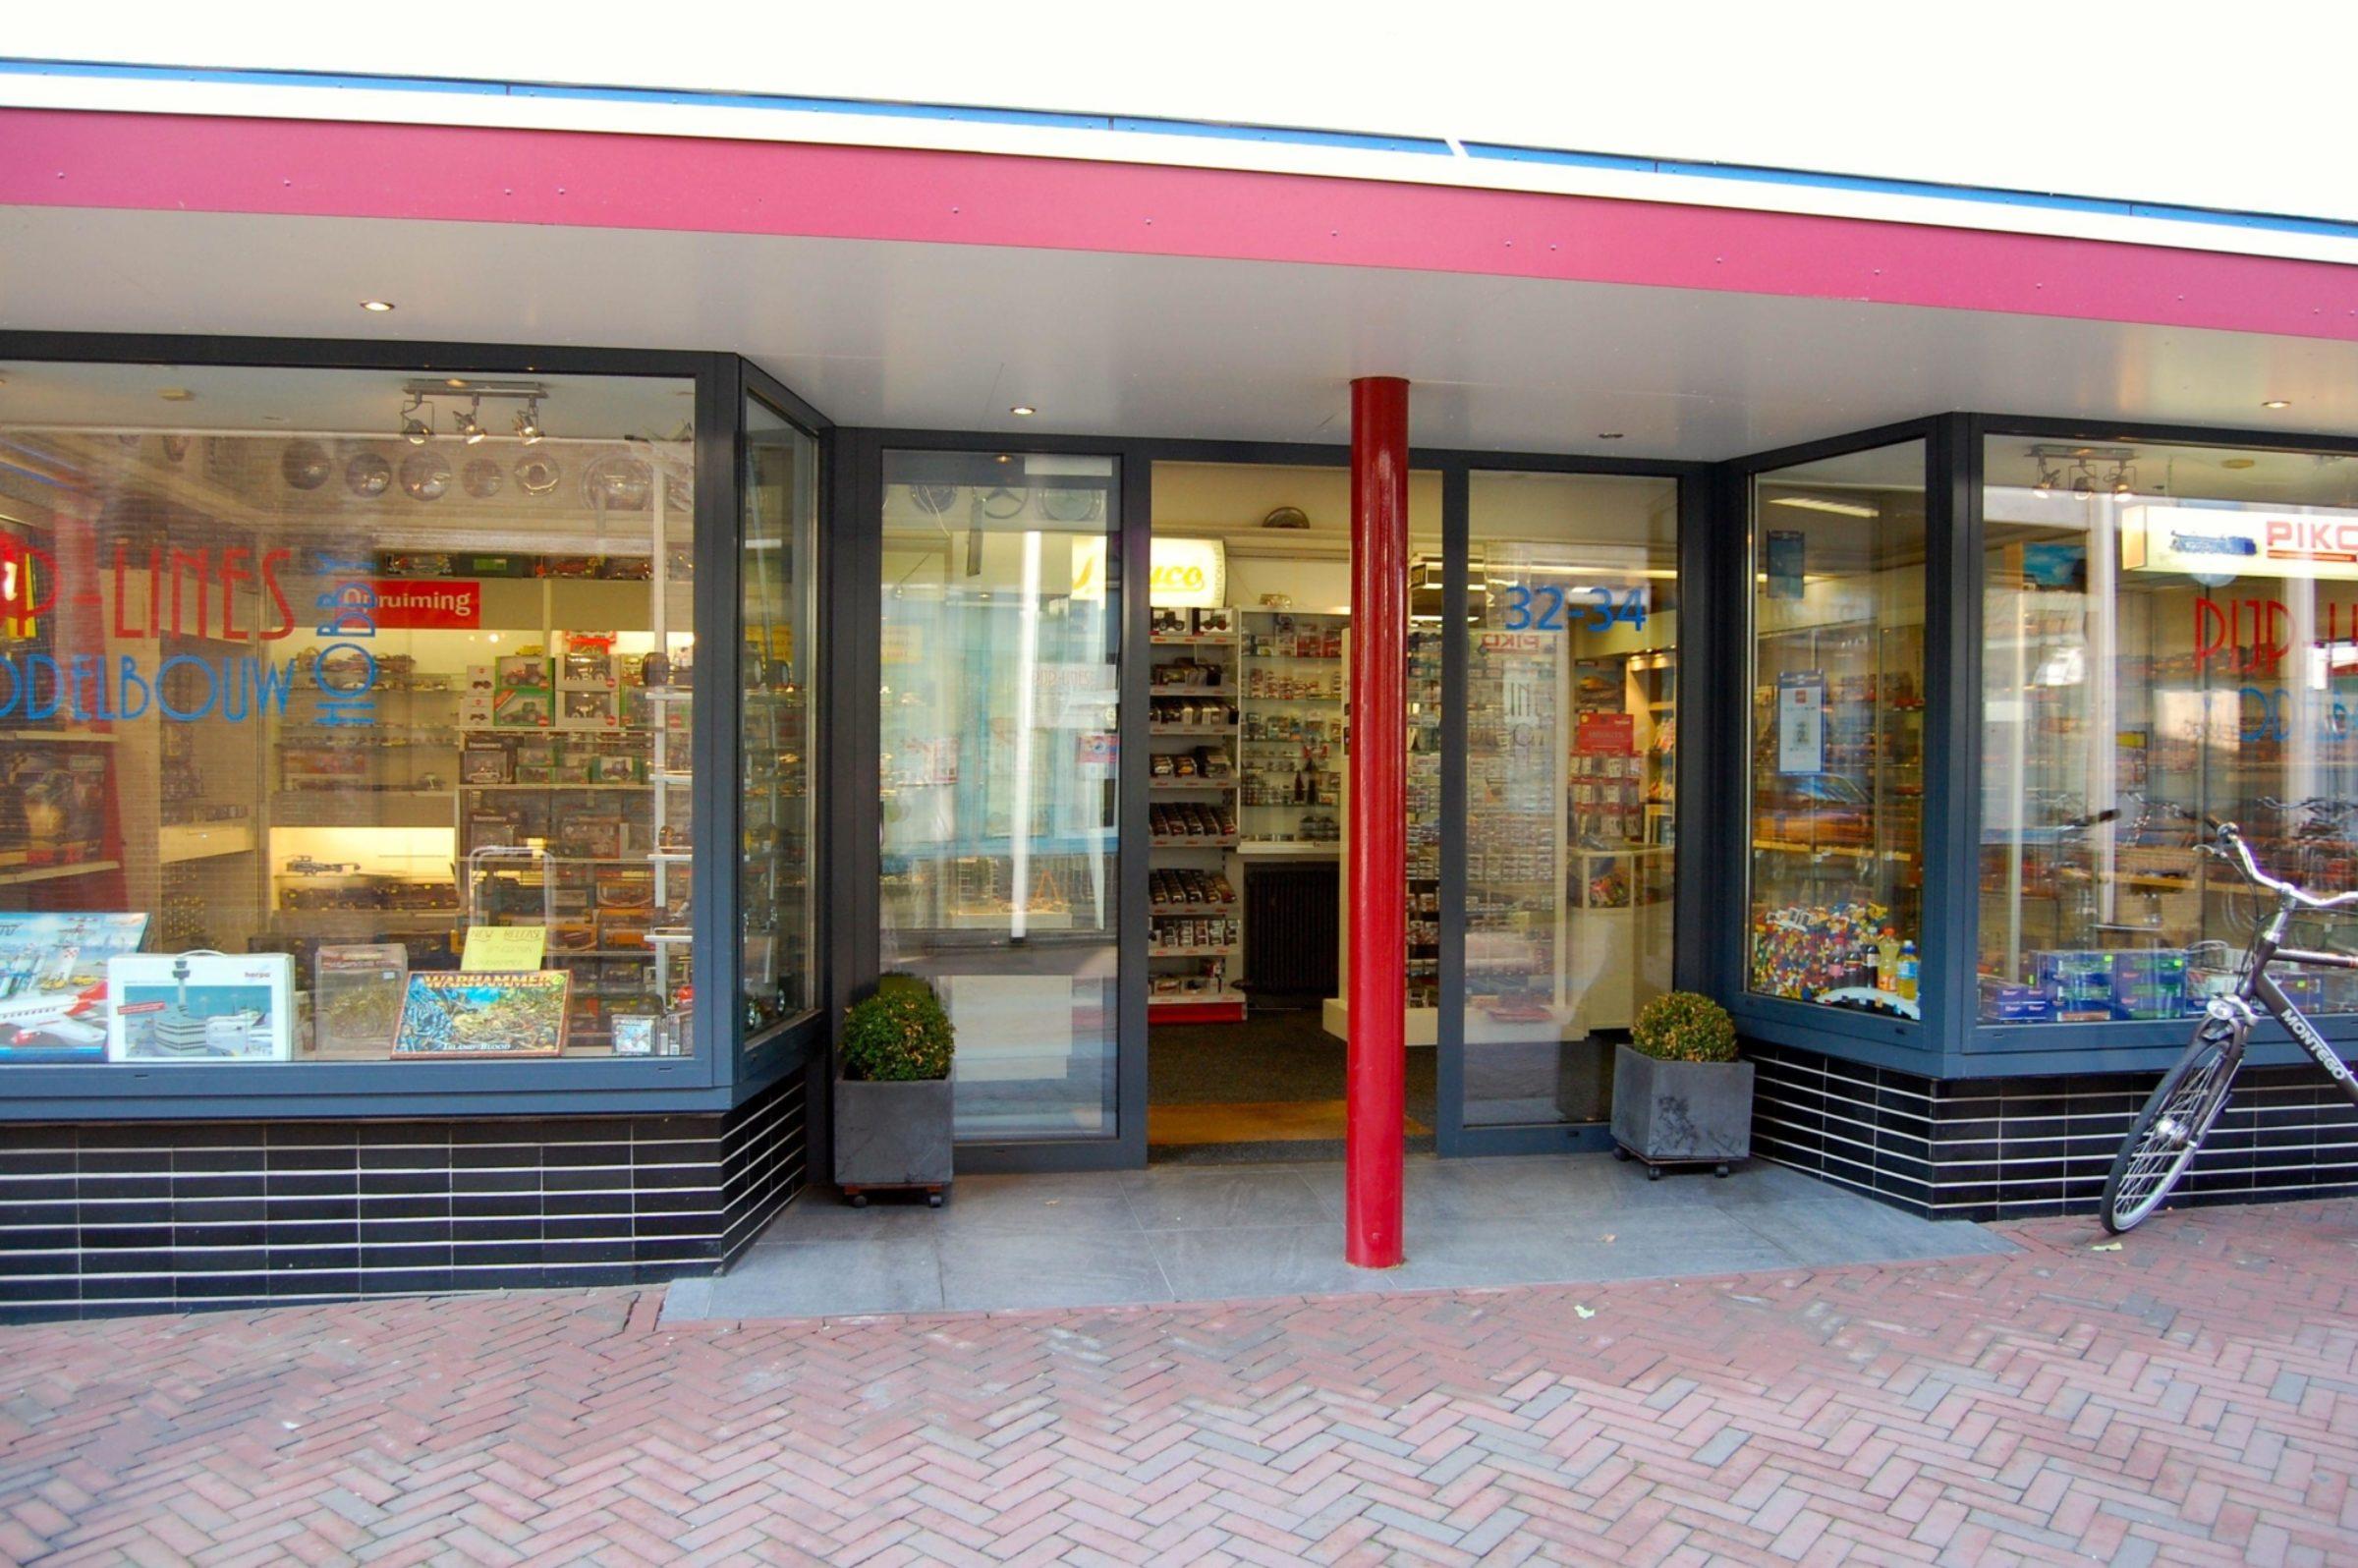 Pijp-Lijnes Enschede